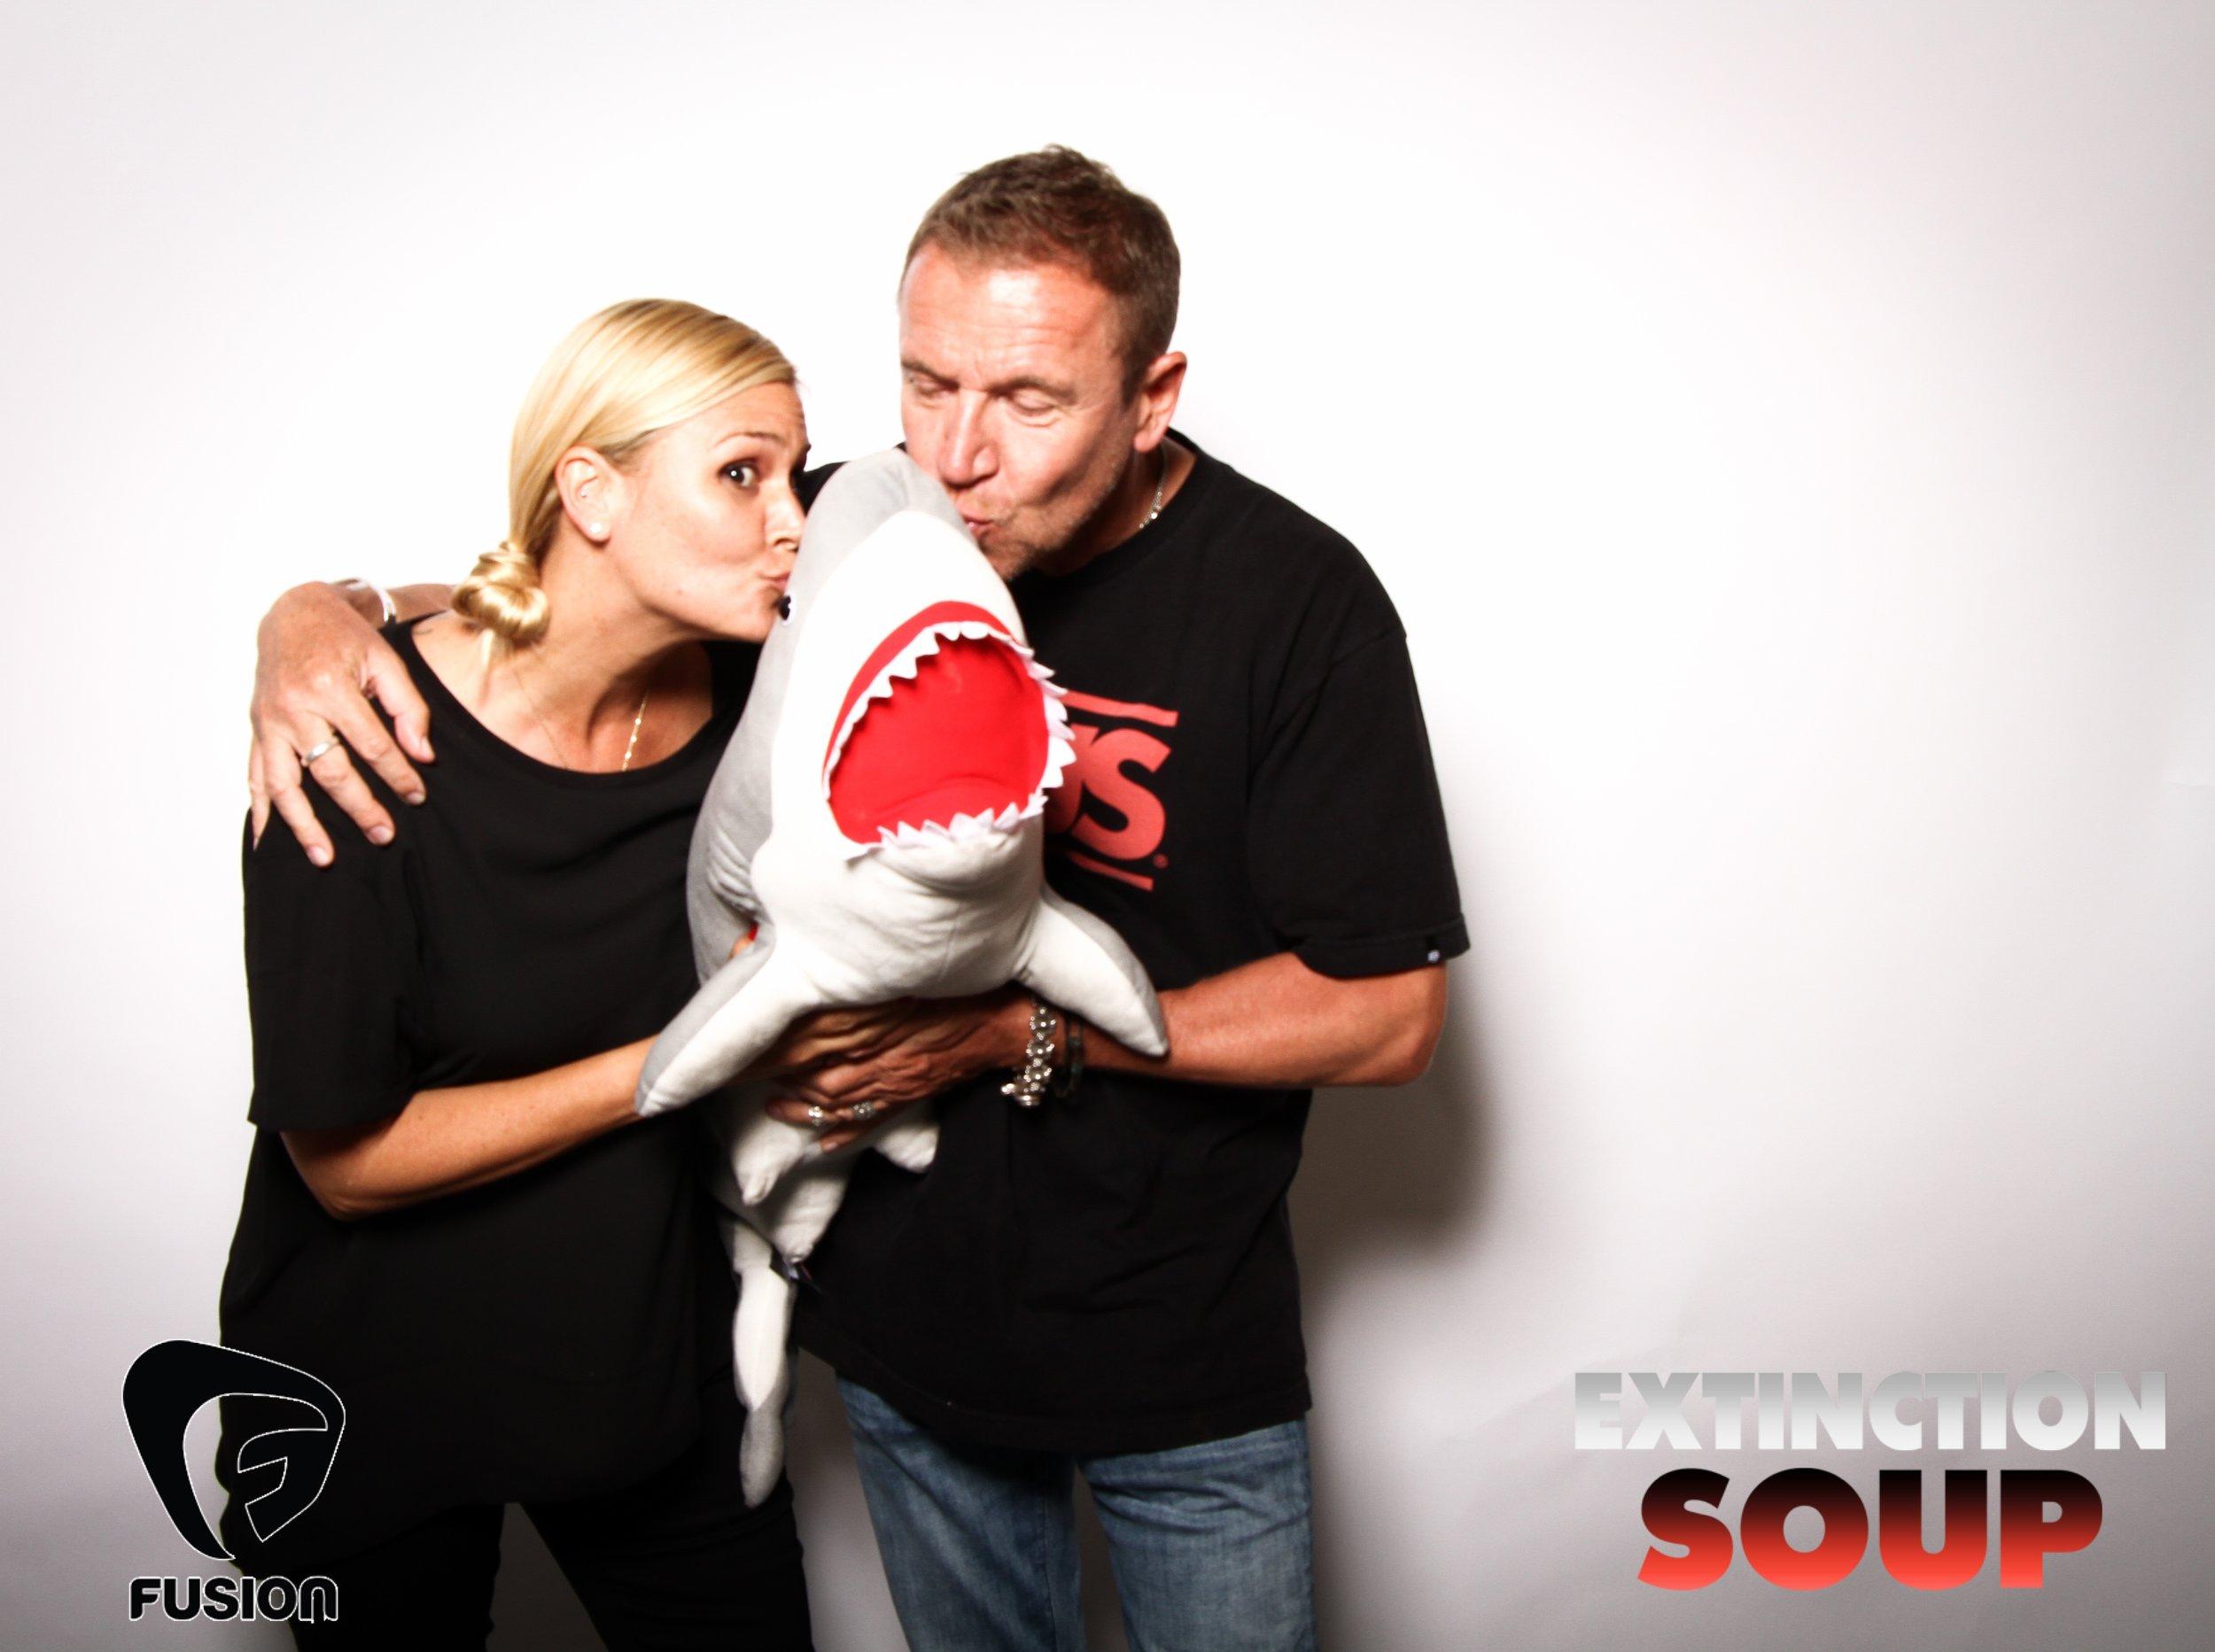 Photo booth fun with shark 9